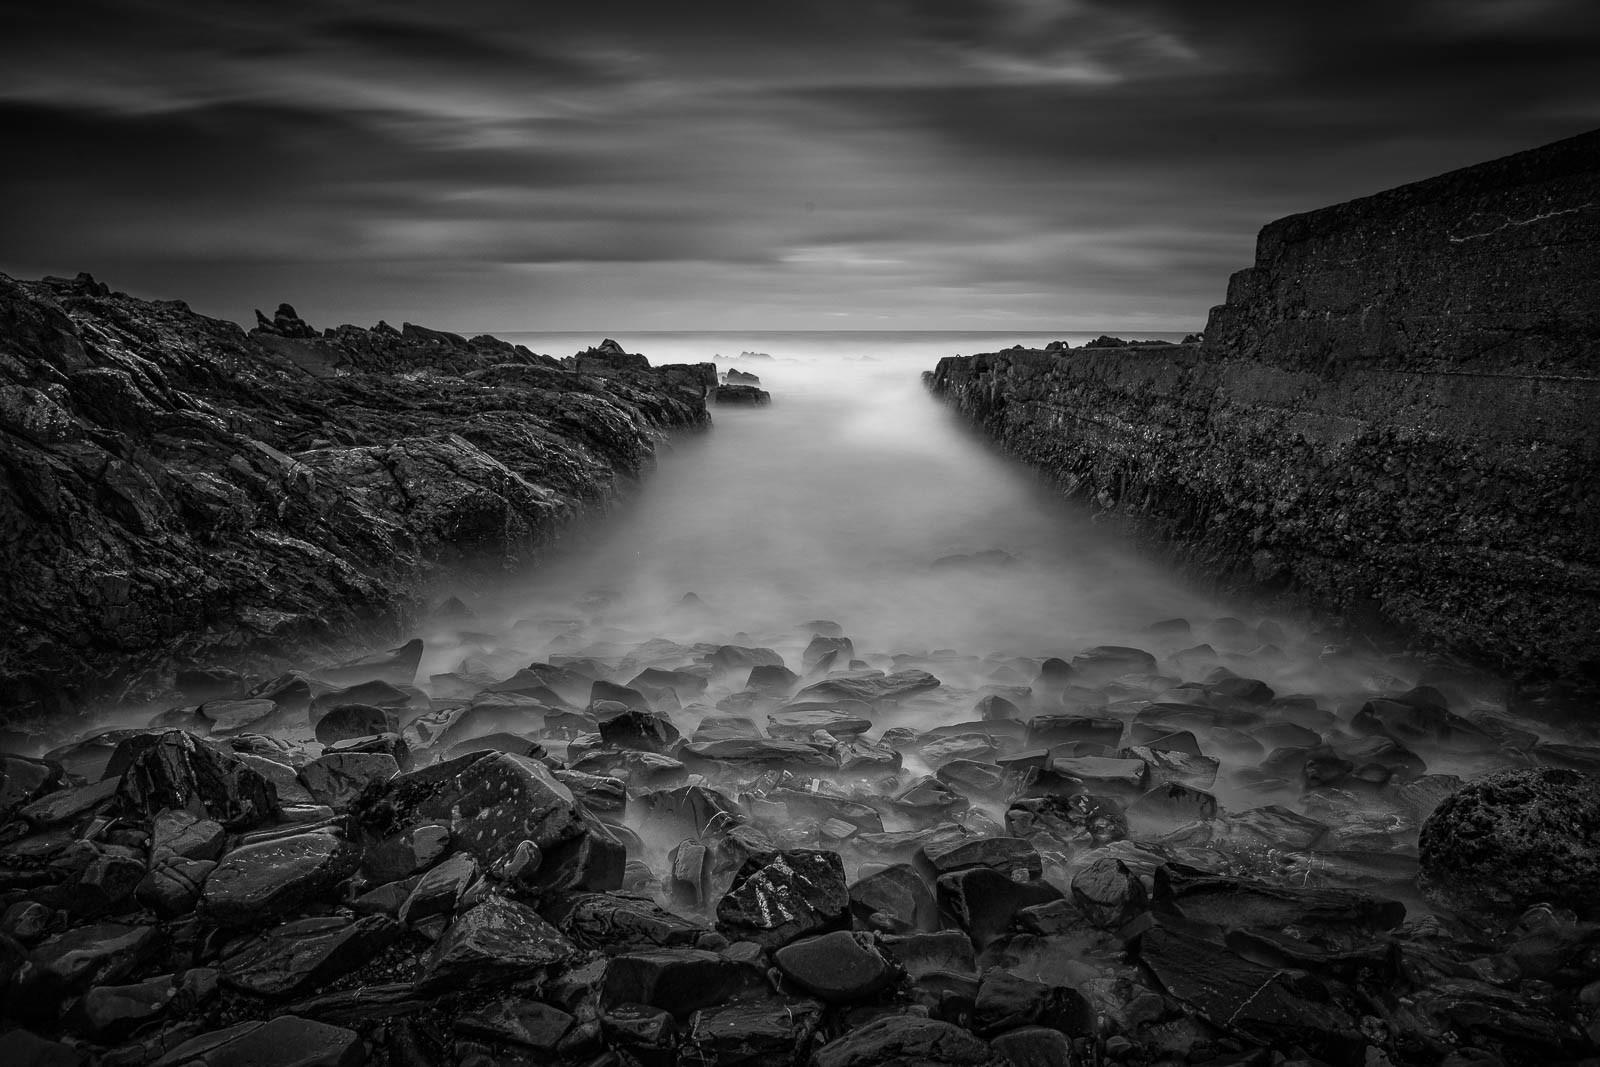 'St. John's Point' by Terry Hanna (12 marks)  -  Ballynahinch Camera Club